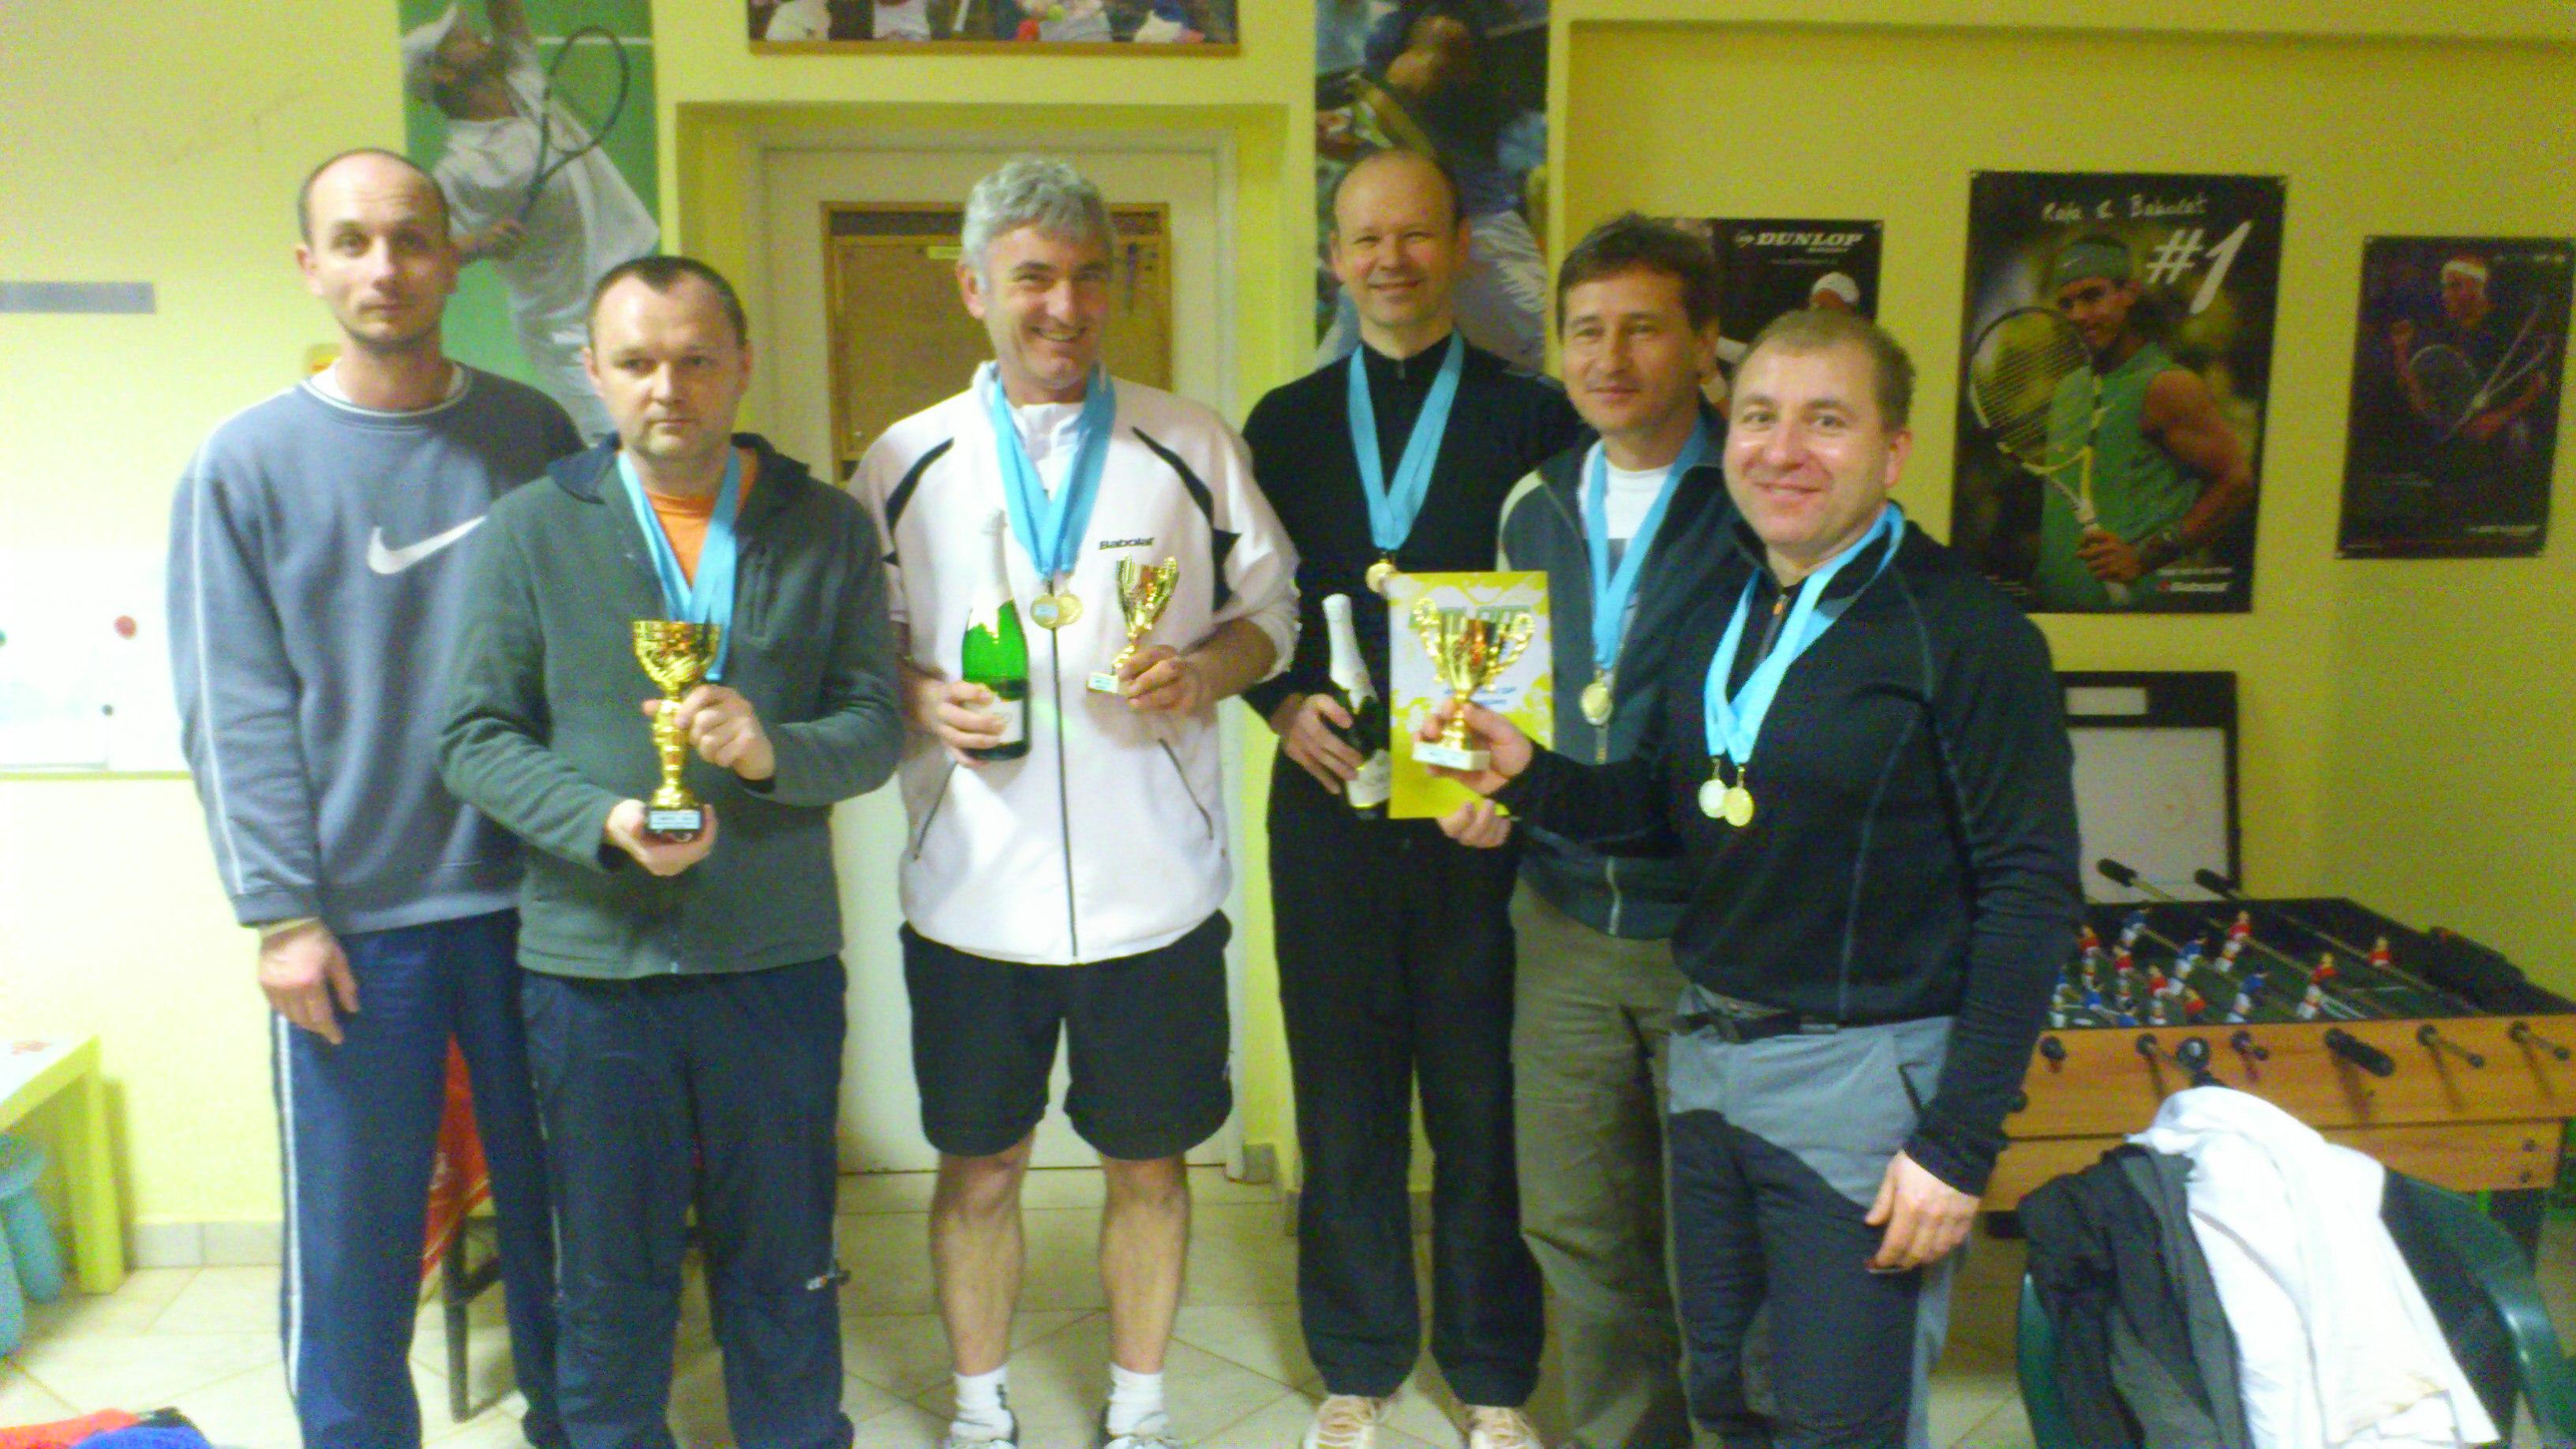 Halový Amater Davis Cup 2012/2013